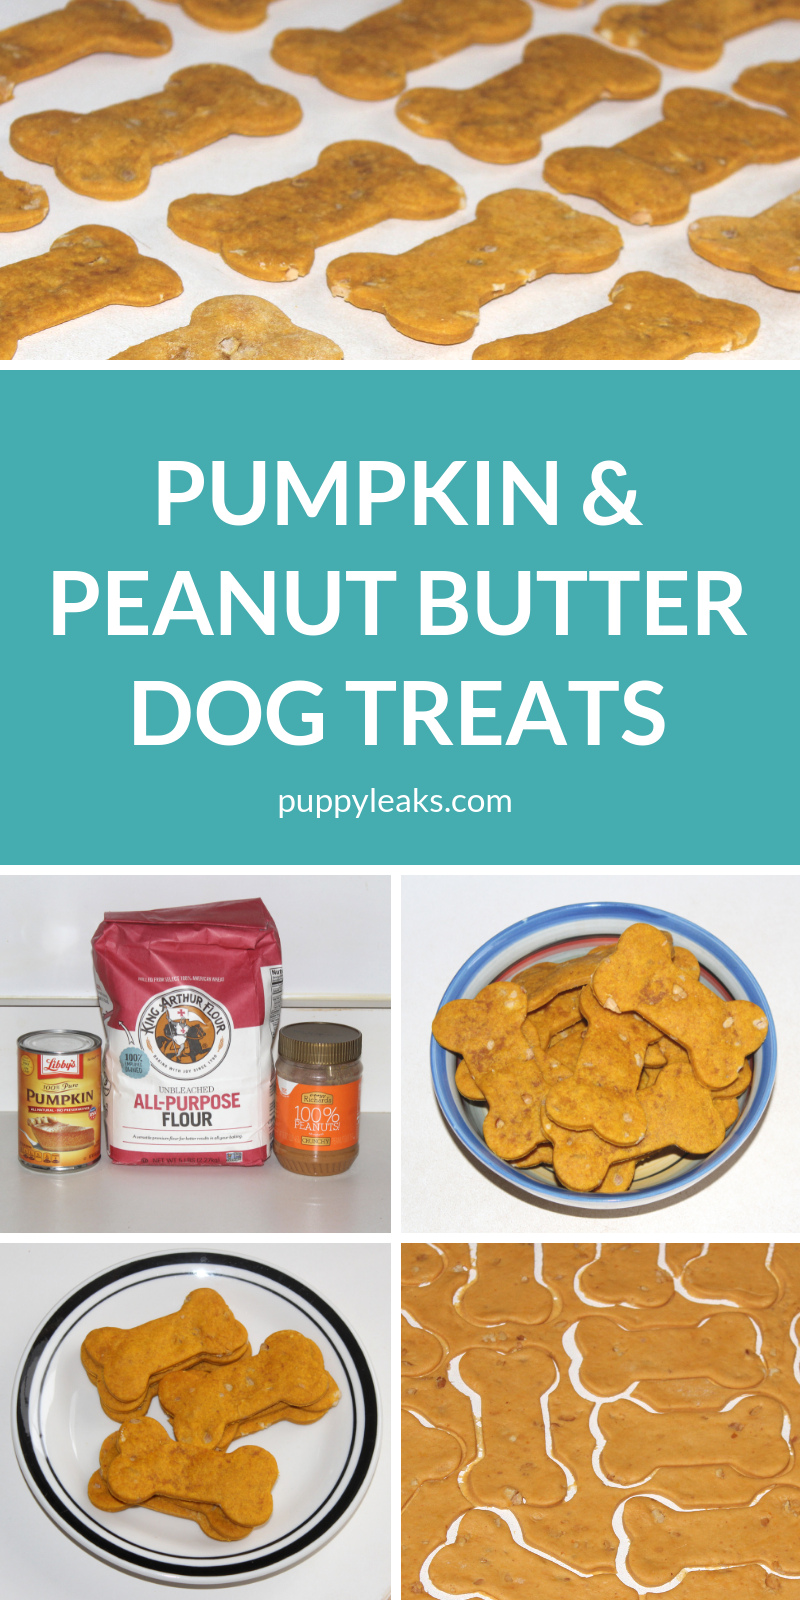 Easy Pumpkin & Peanut Butter Dog Treat Recipe